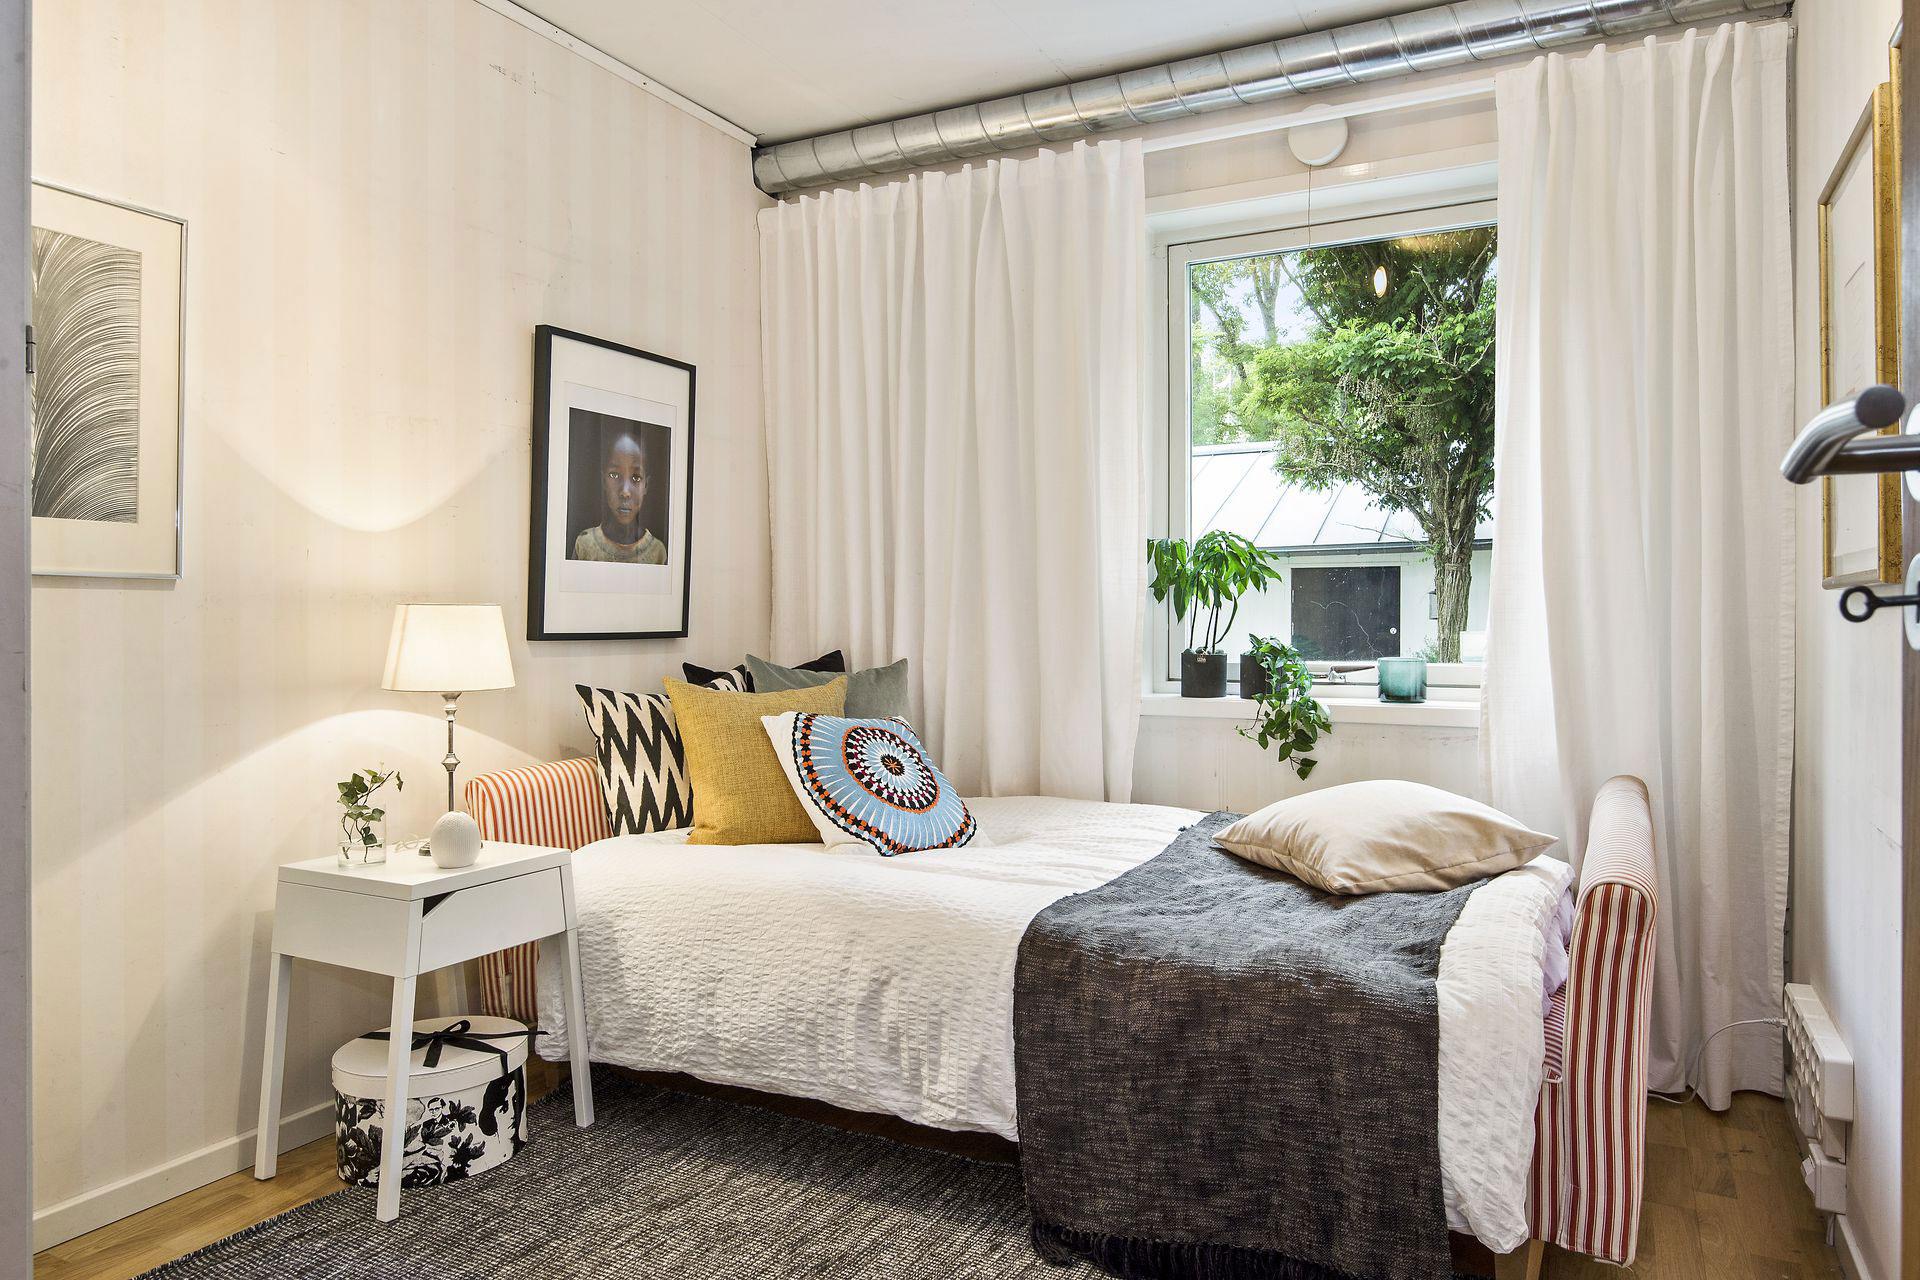 Stylish Home in Särö Sweden-42